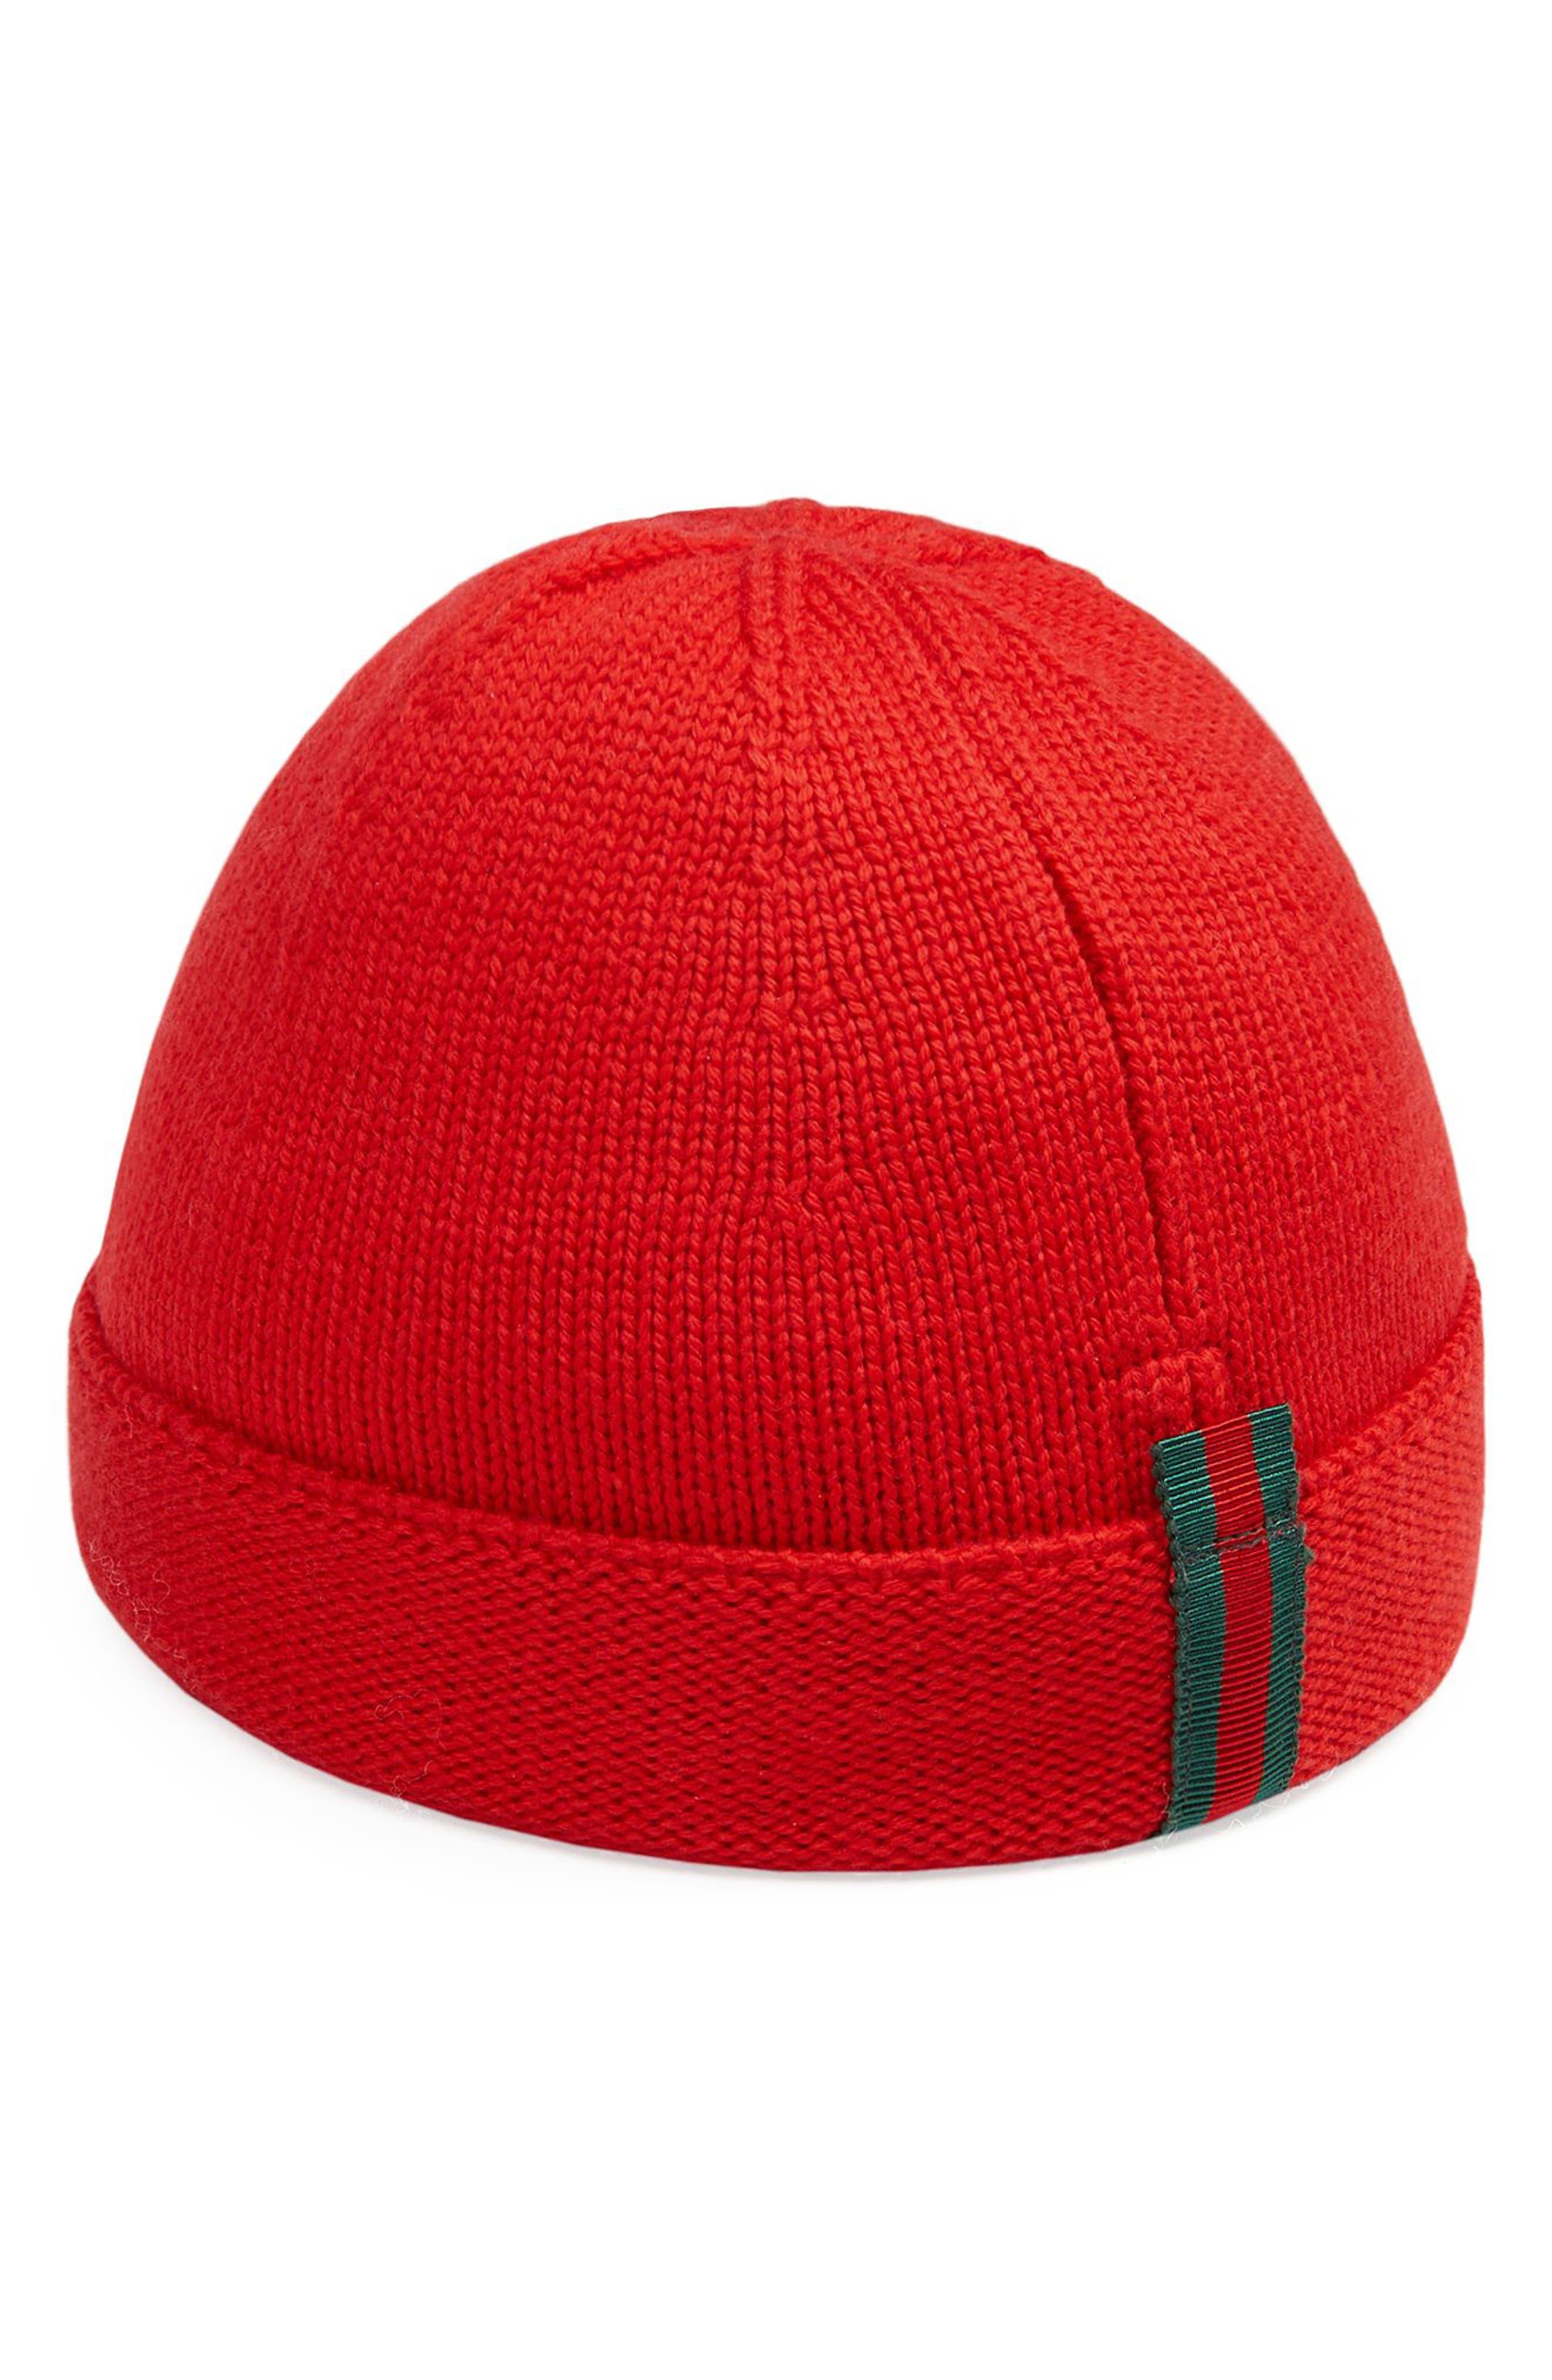 WOOL BEANIE - RED